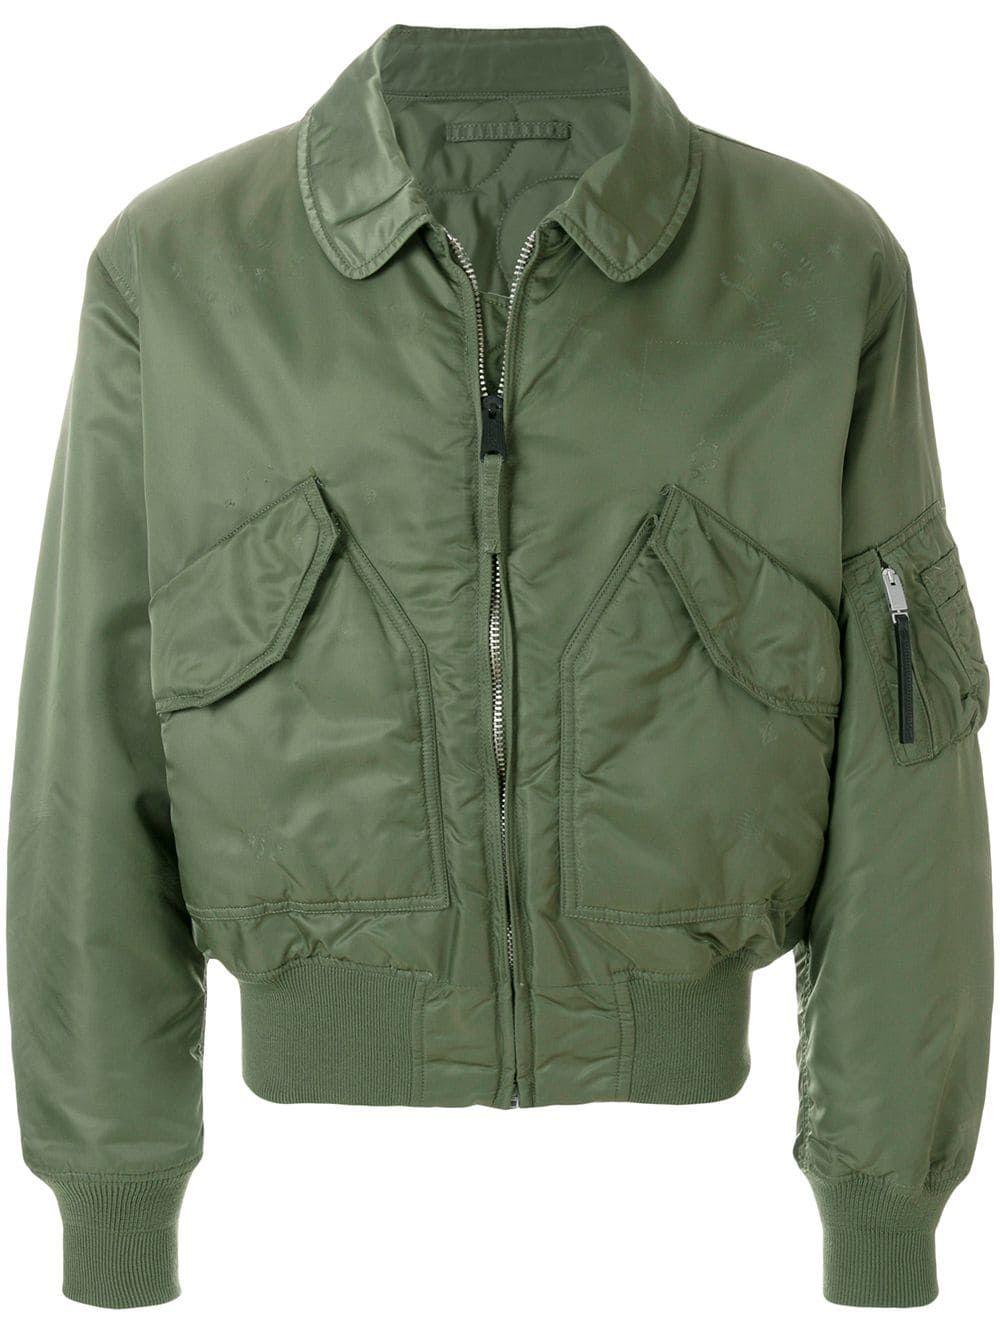 1017 Alyx 9sm Logo Bomber Jacket Farfetch Designer Jackets For Men Jackets Bomber Jacket [ 1334 x 1000 Pixel ]